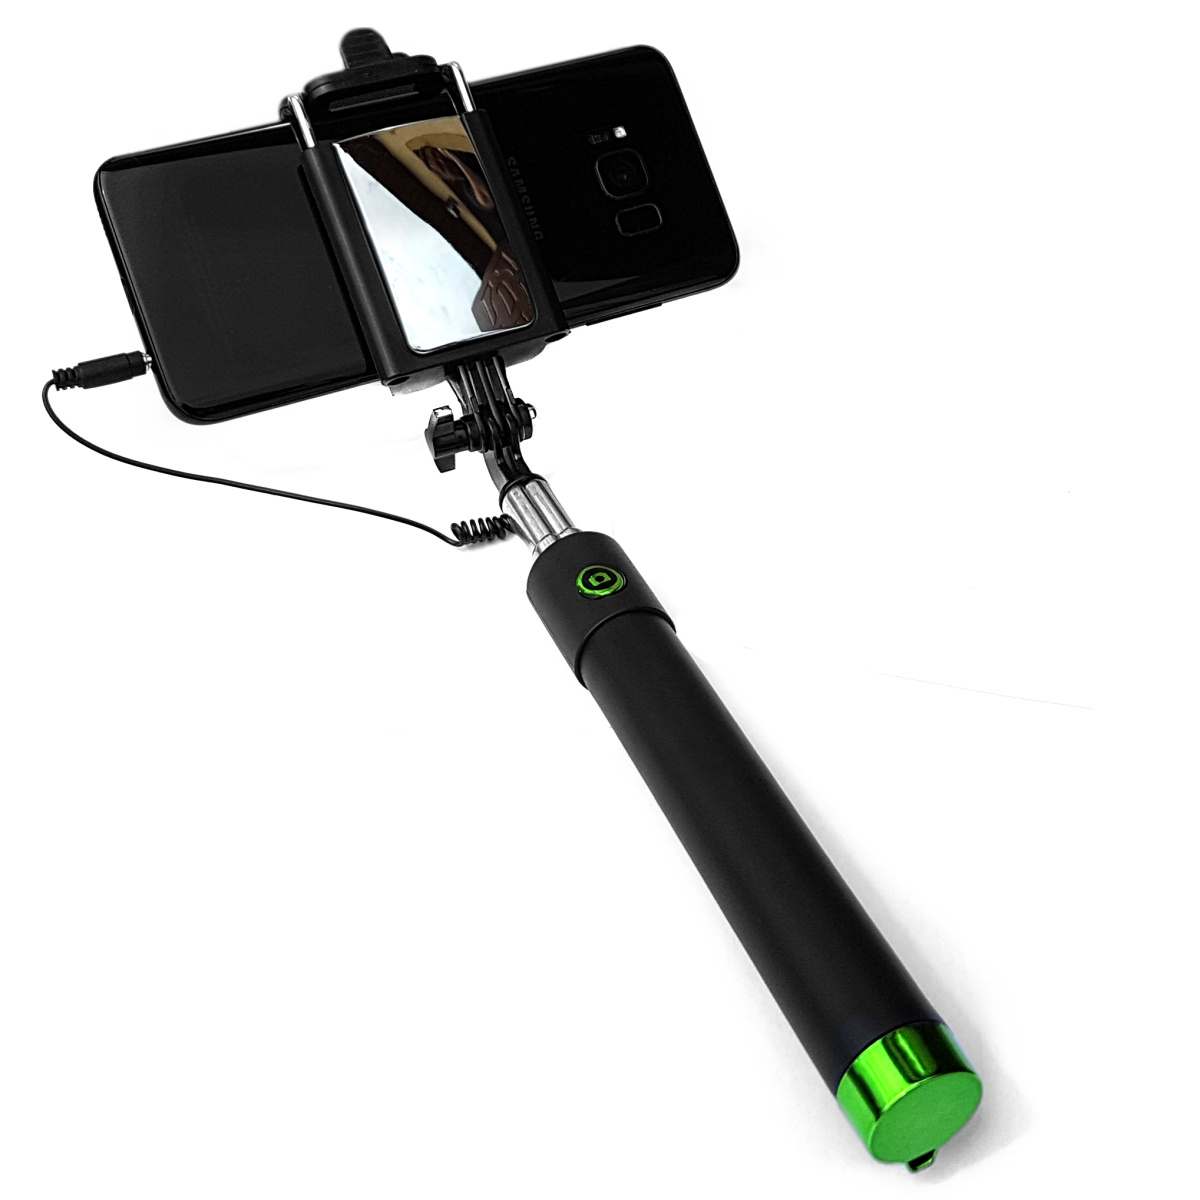 Kijek Selfiestick Monopod Lark Stratus 5 LTE